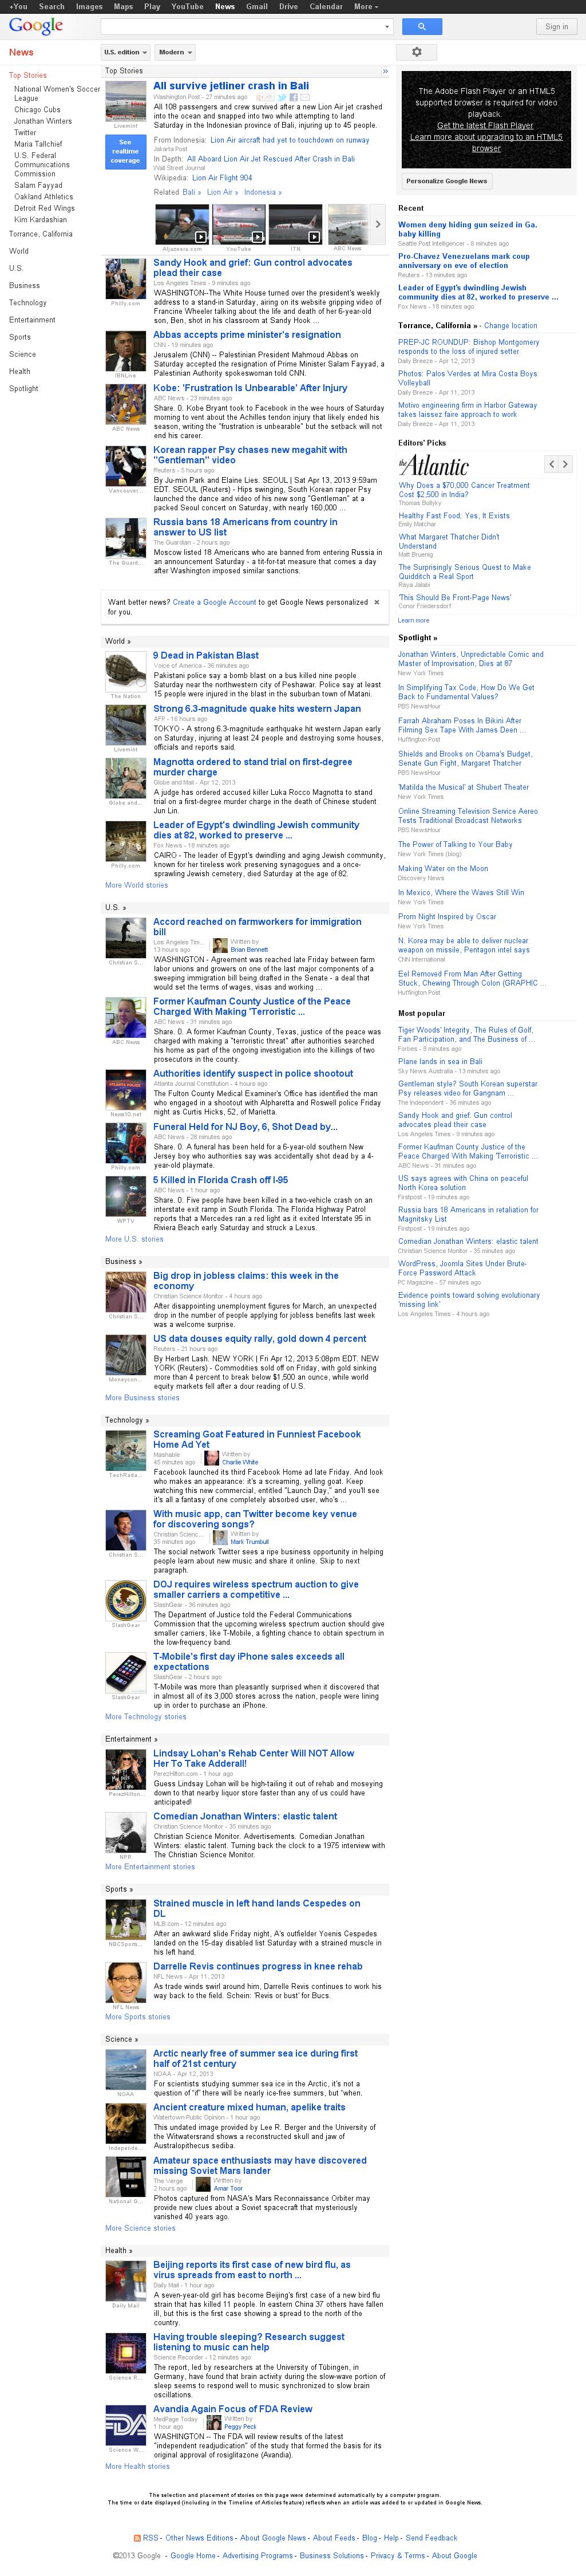 Google News at Saturday April 13, 2013, 7:08 p.m. UTC